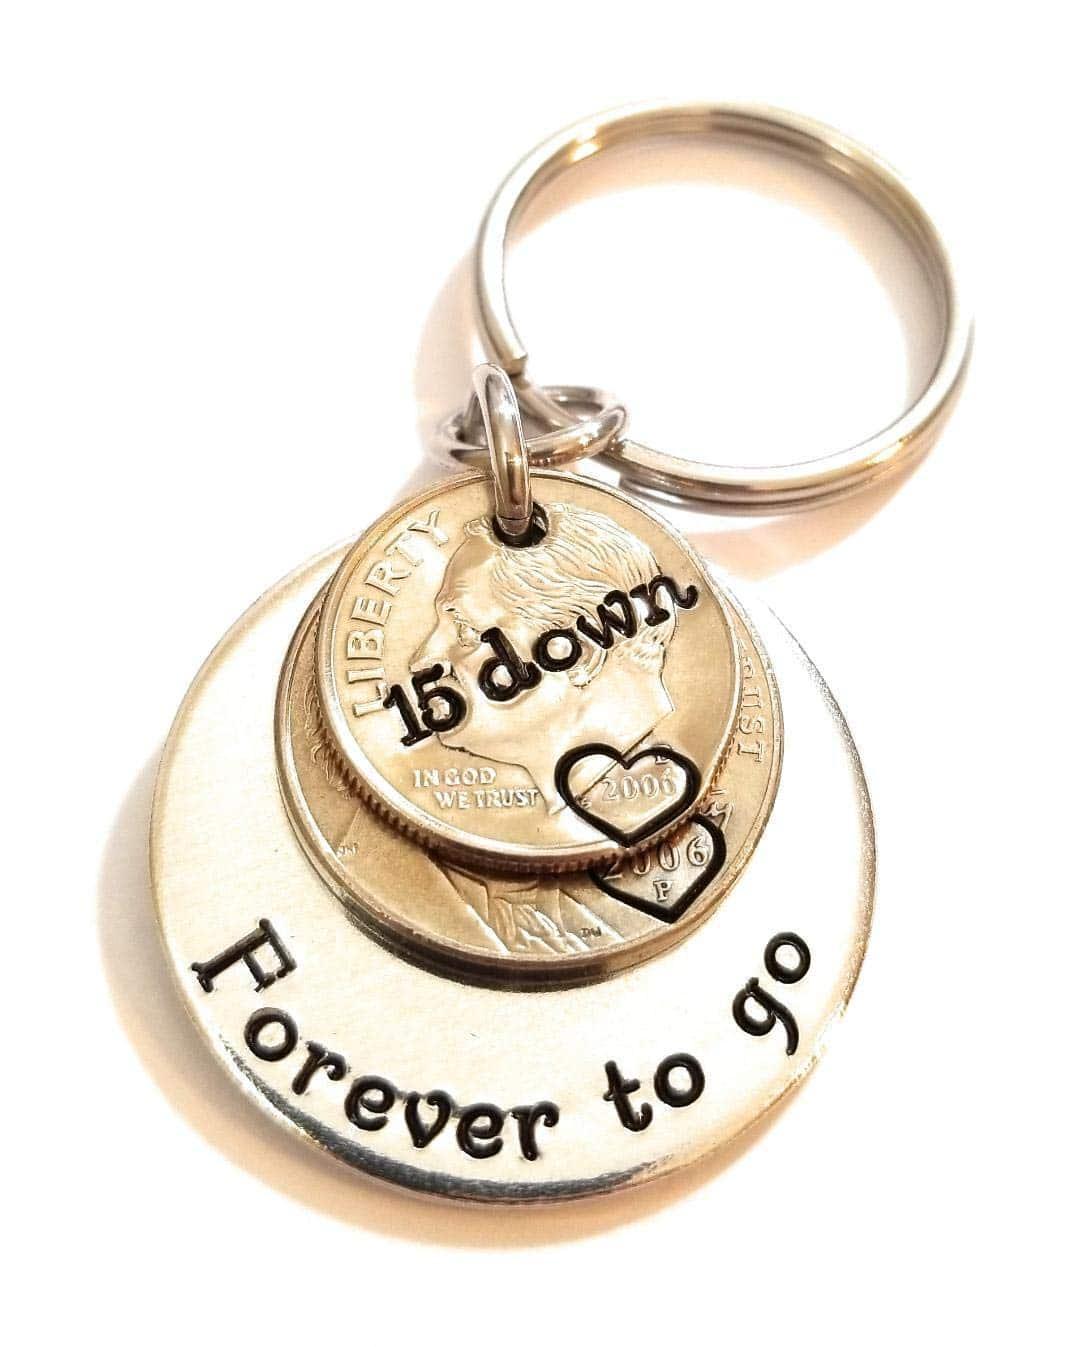 15th-anniversary-gifts-keychain